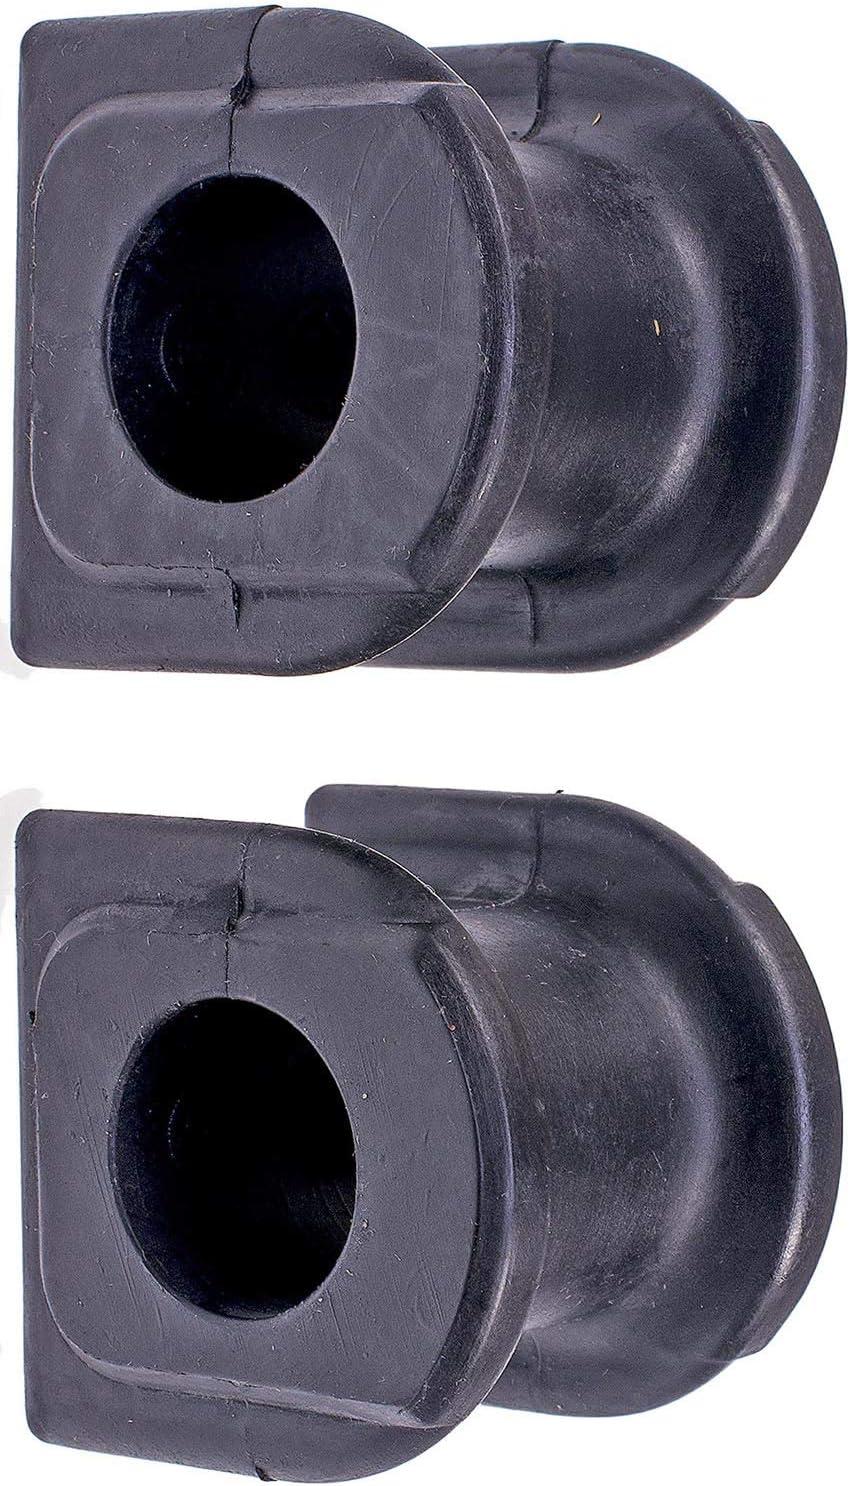 APDTY 146950 Bushing Max 4 years warranty 47% OFF